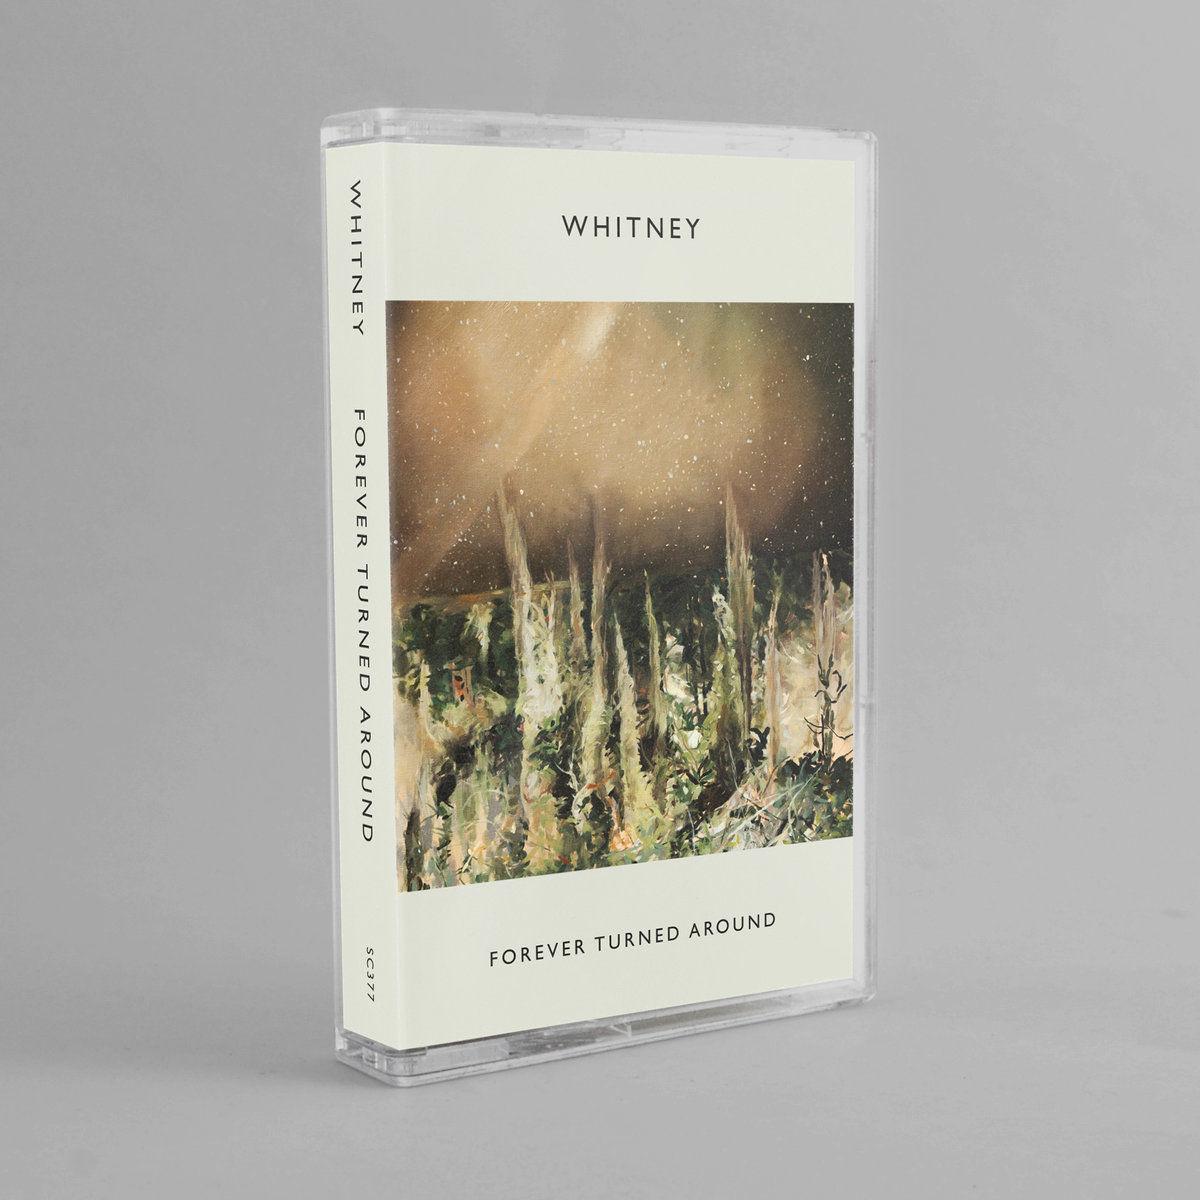 「whitney forever turned around vinyl」の画像検索結果